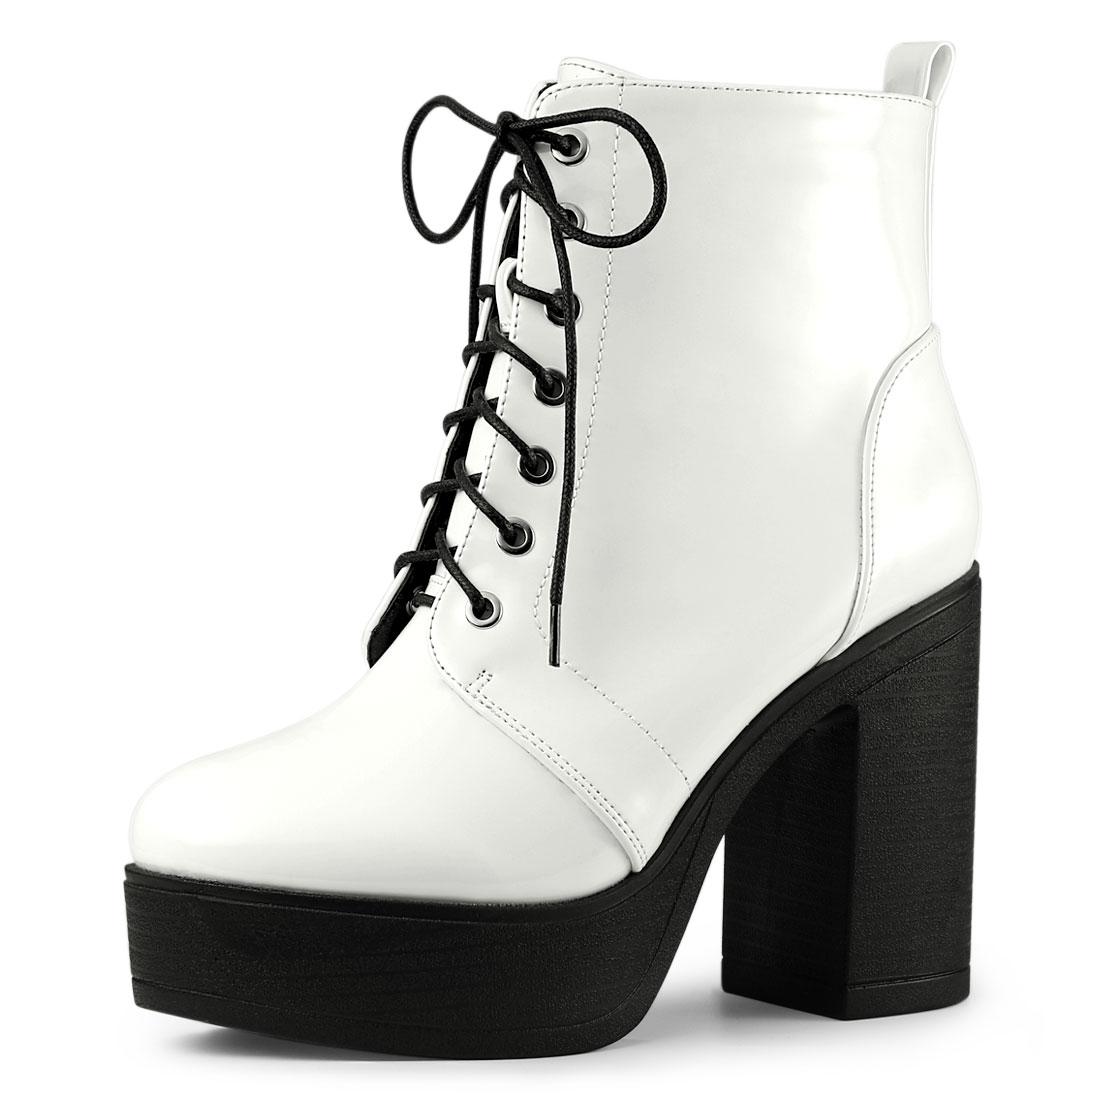 Allegra K Women's Platform Chunky High Heel Lace Up Combat Boots White US 10